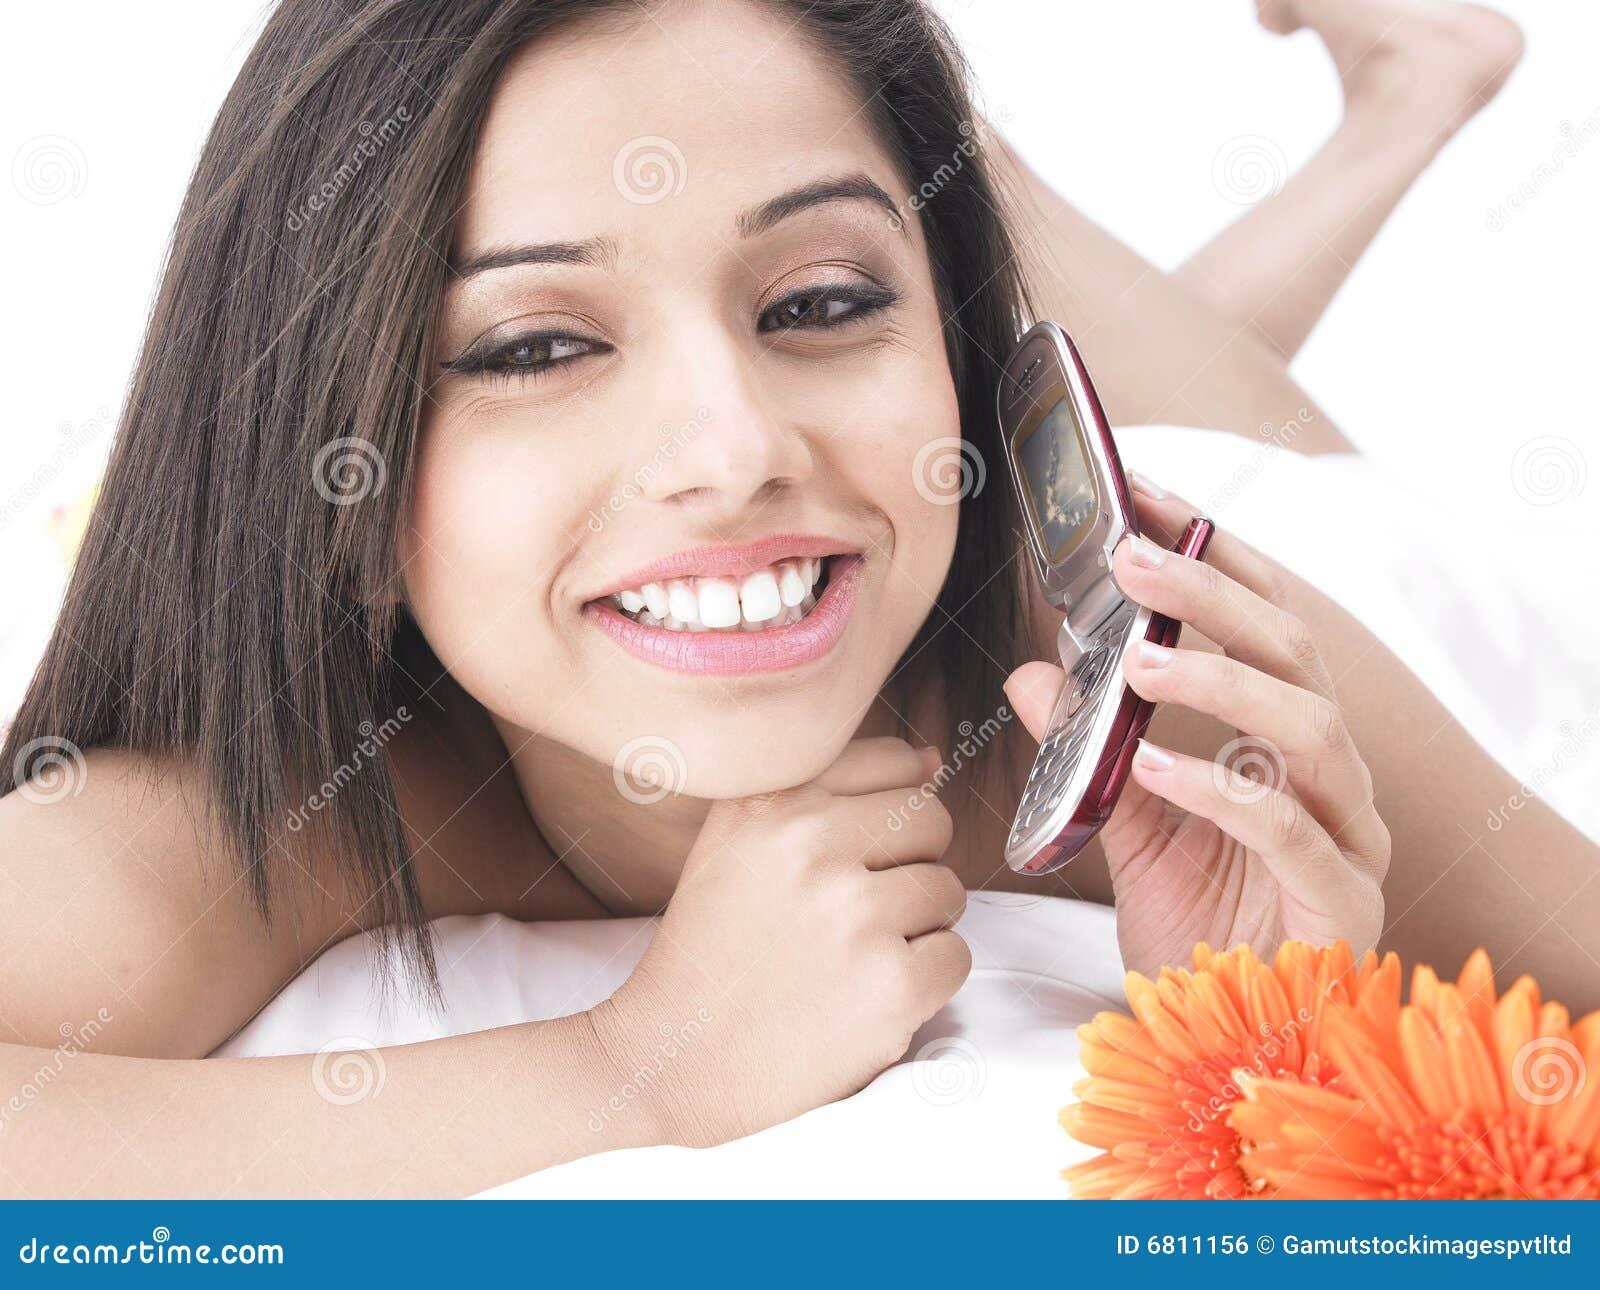 Asian Woman In Bed With Petals Stock Photography  Cartoondealercom 6811286-4469